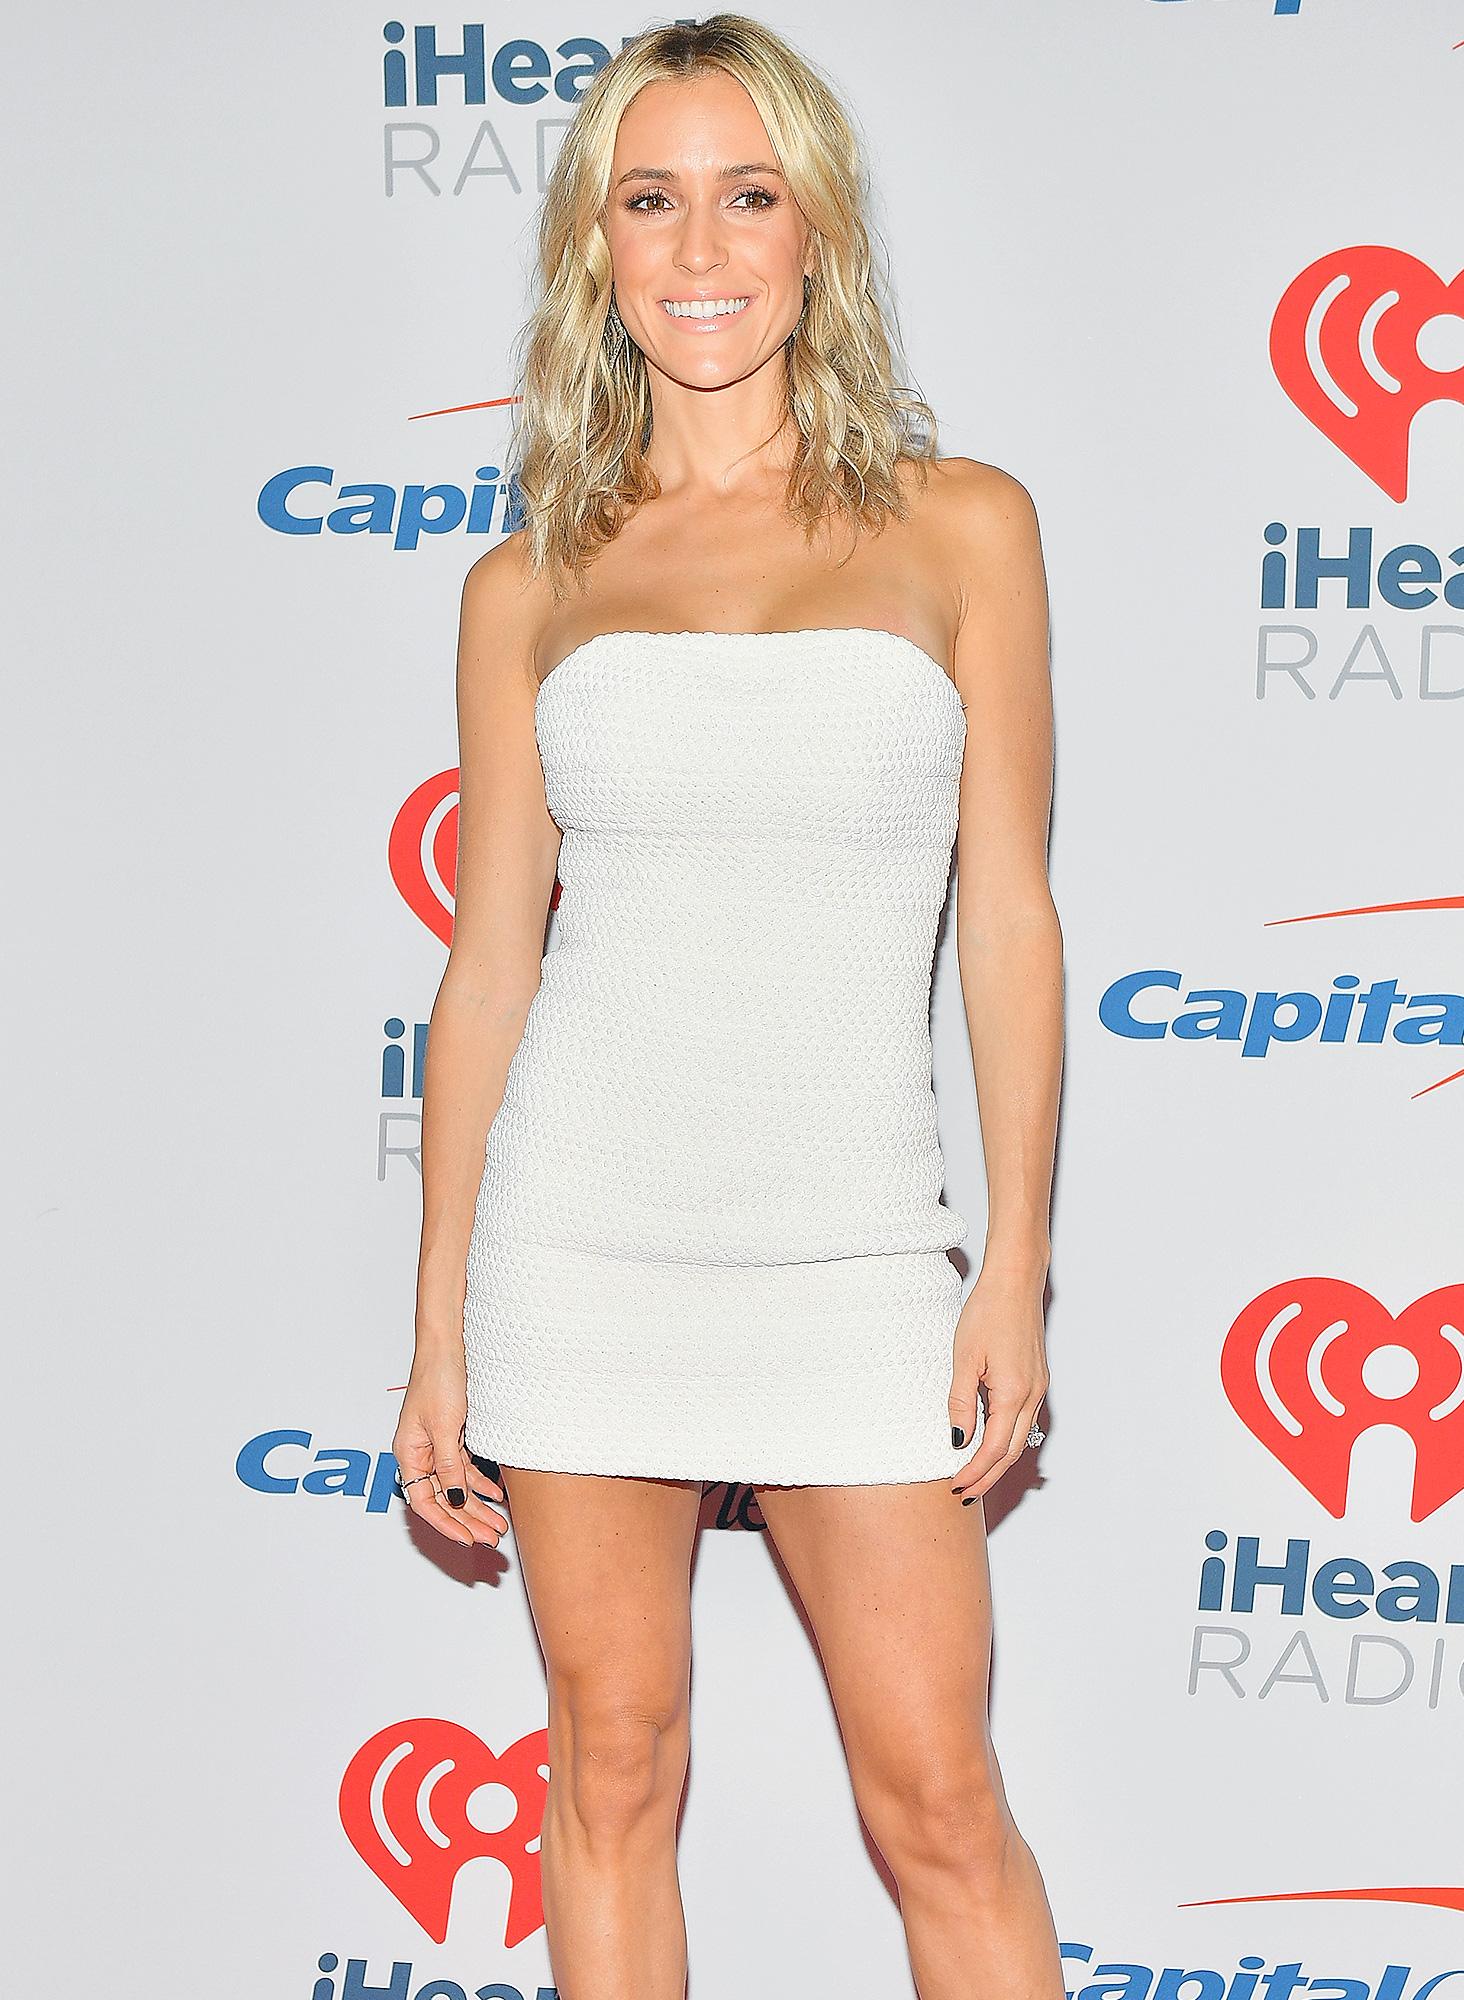 Hacked Kristin Cavallari nude (39 photos), Sexy, Paparazzi, Feet, cleavage 2015